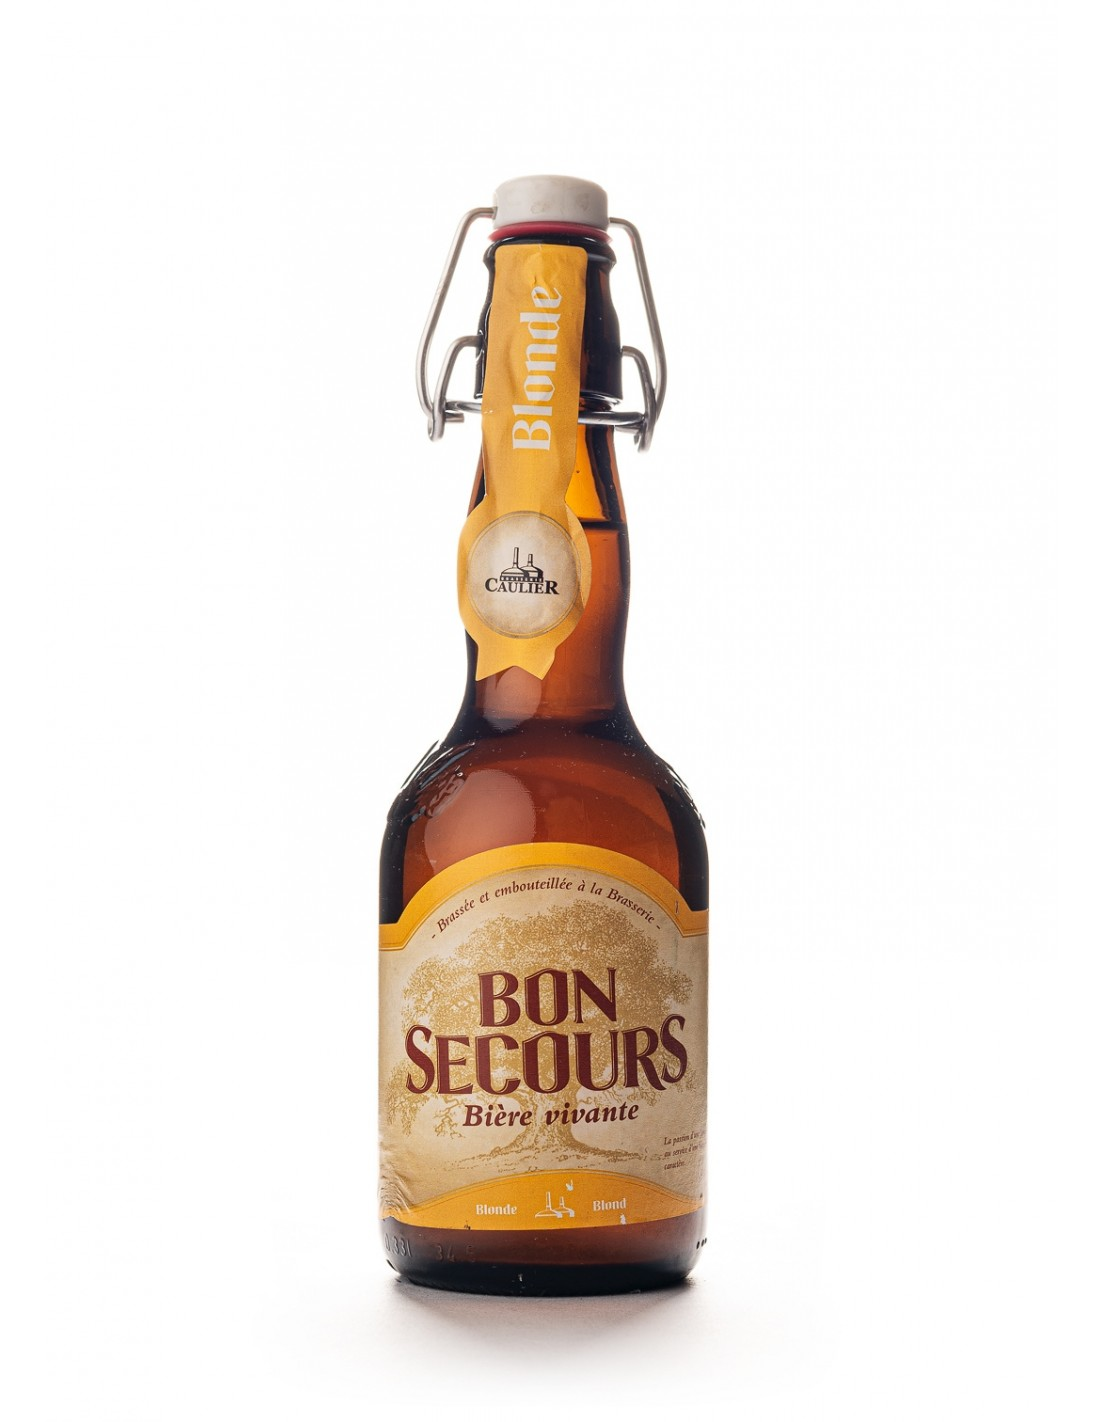 Bere blonda Bon Secours, 8% alc., 0.33L, Belgia